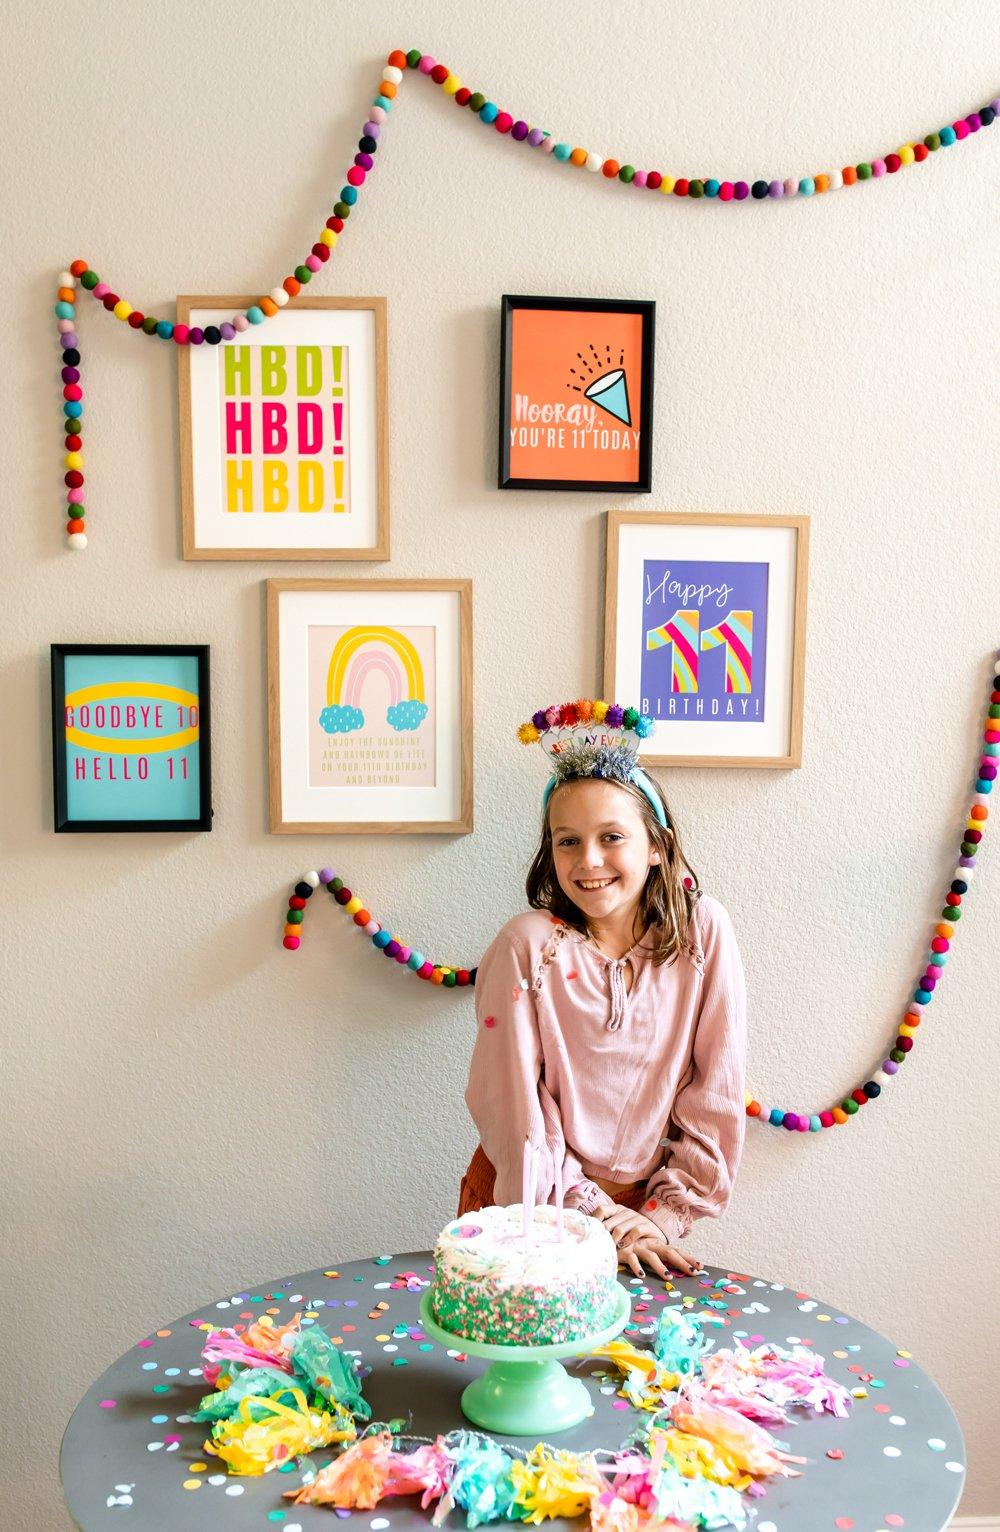 11 year old birthday quotes decor